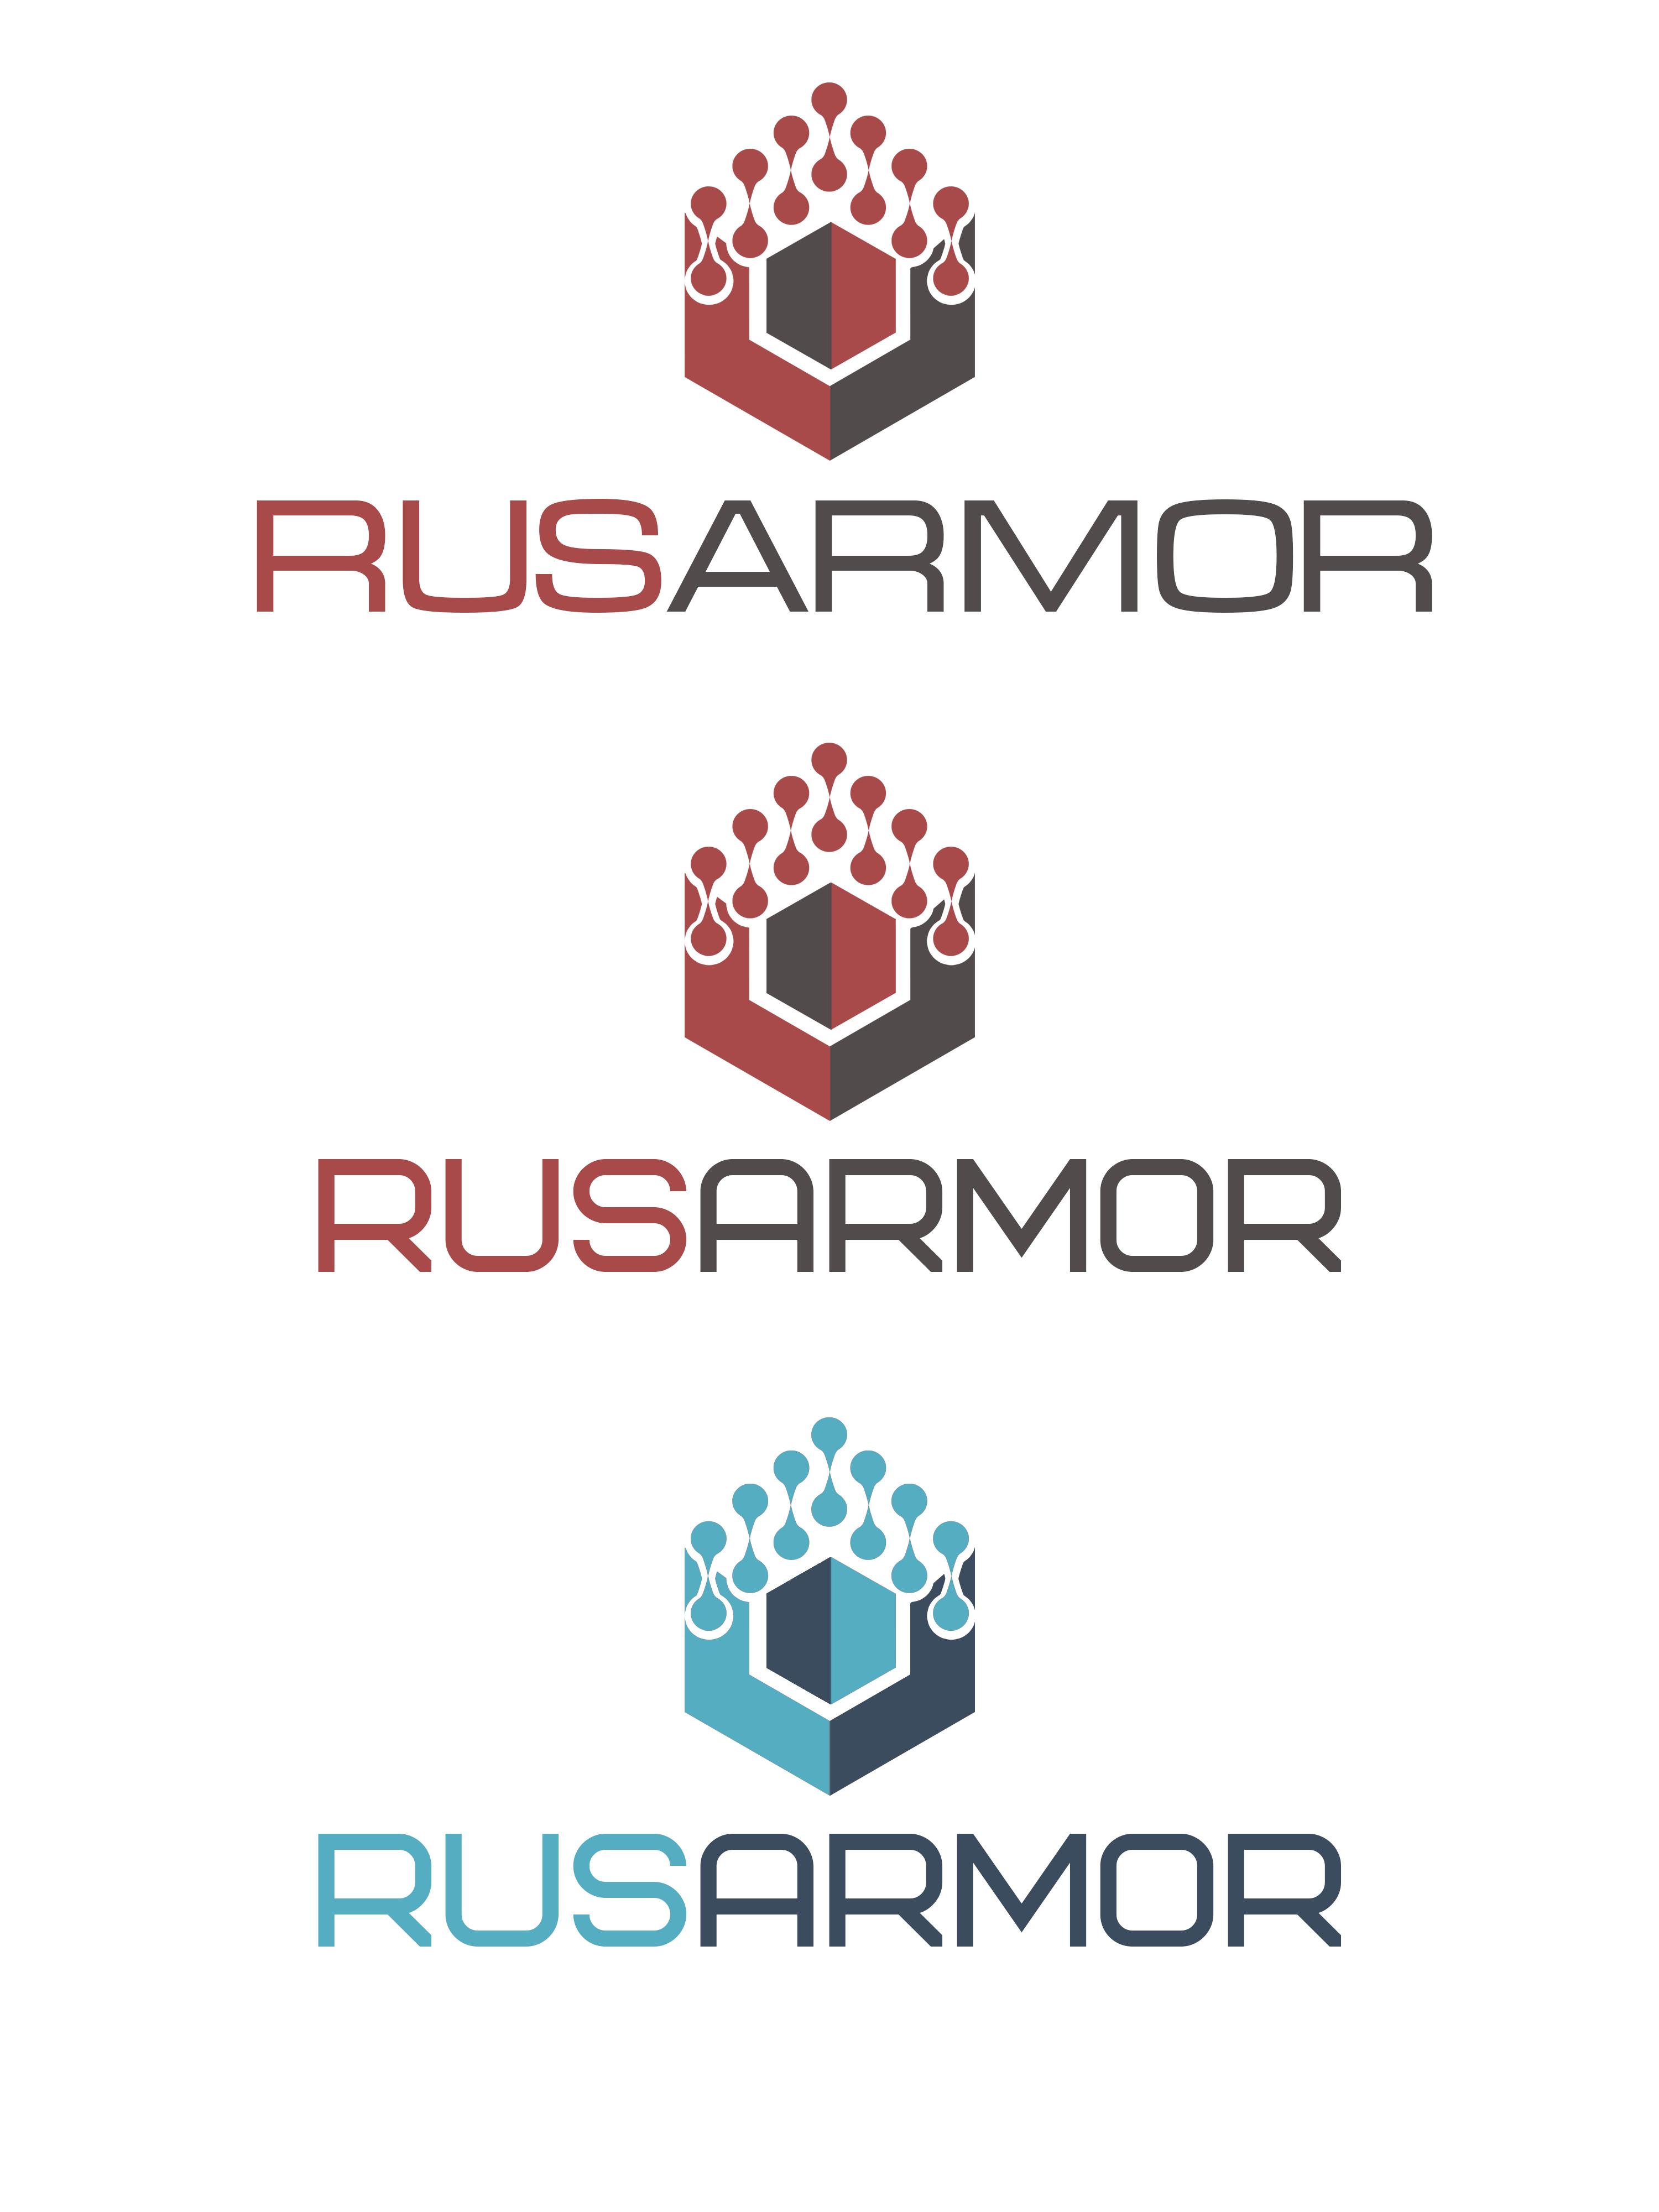 Разработка логотипа технологического стартапа РУСАРМОР фото f_8555a0ee5d8188a8.png